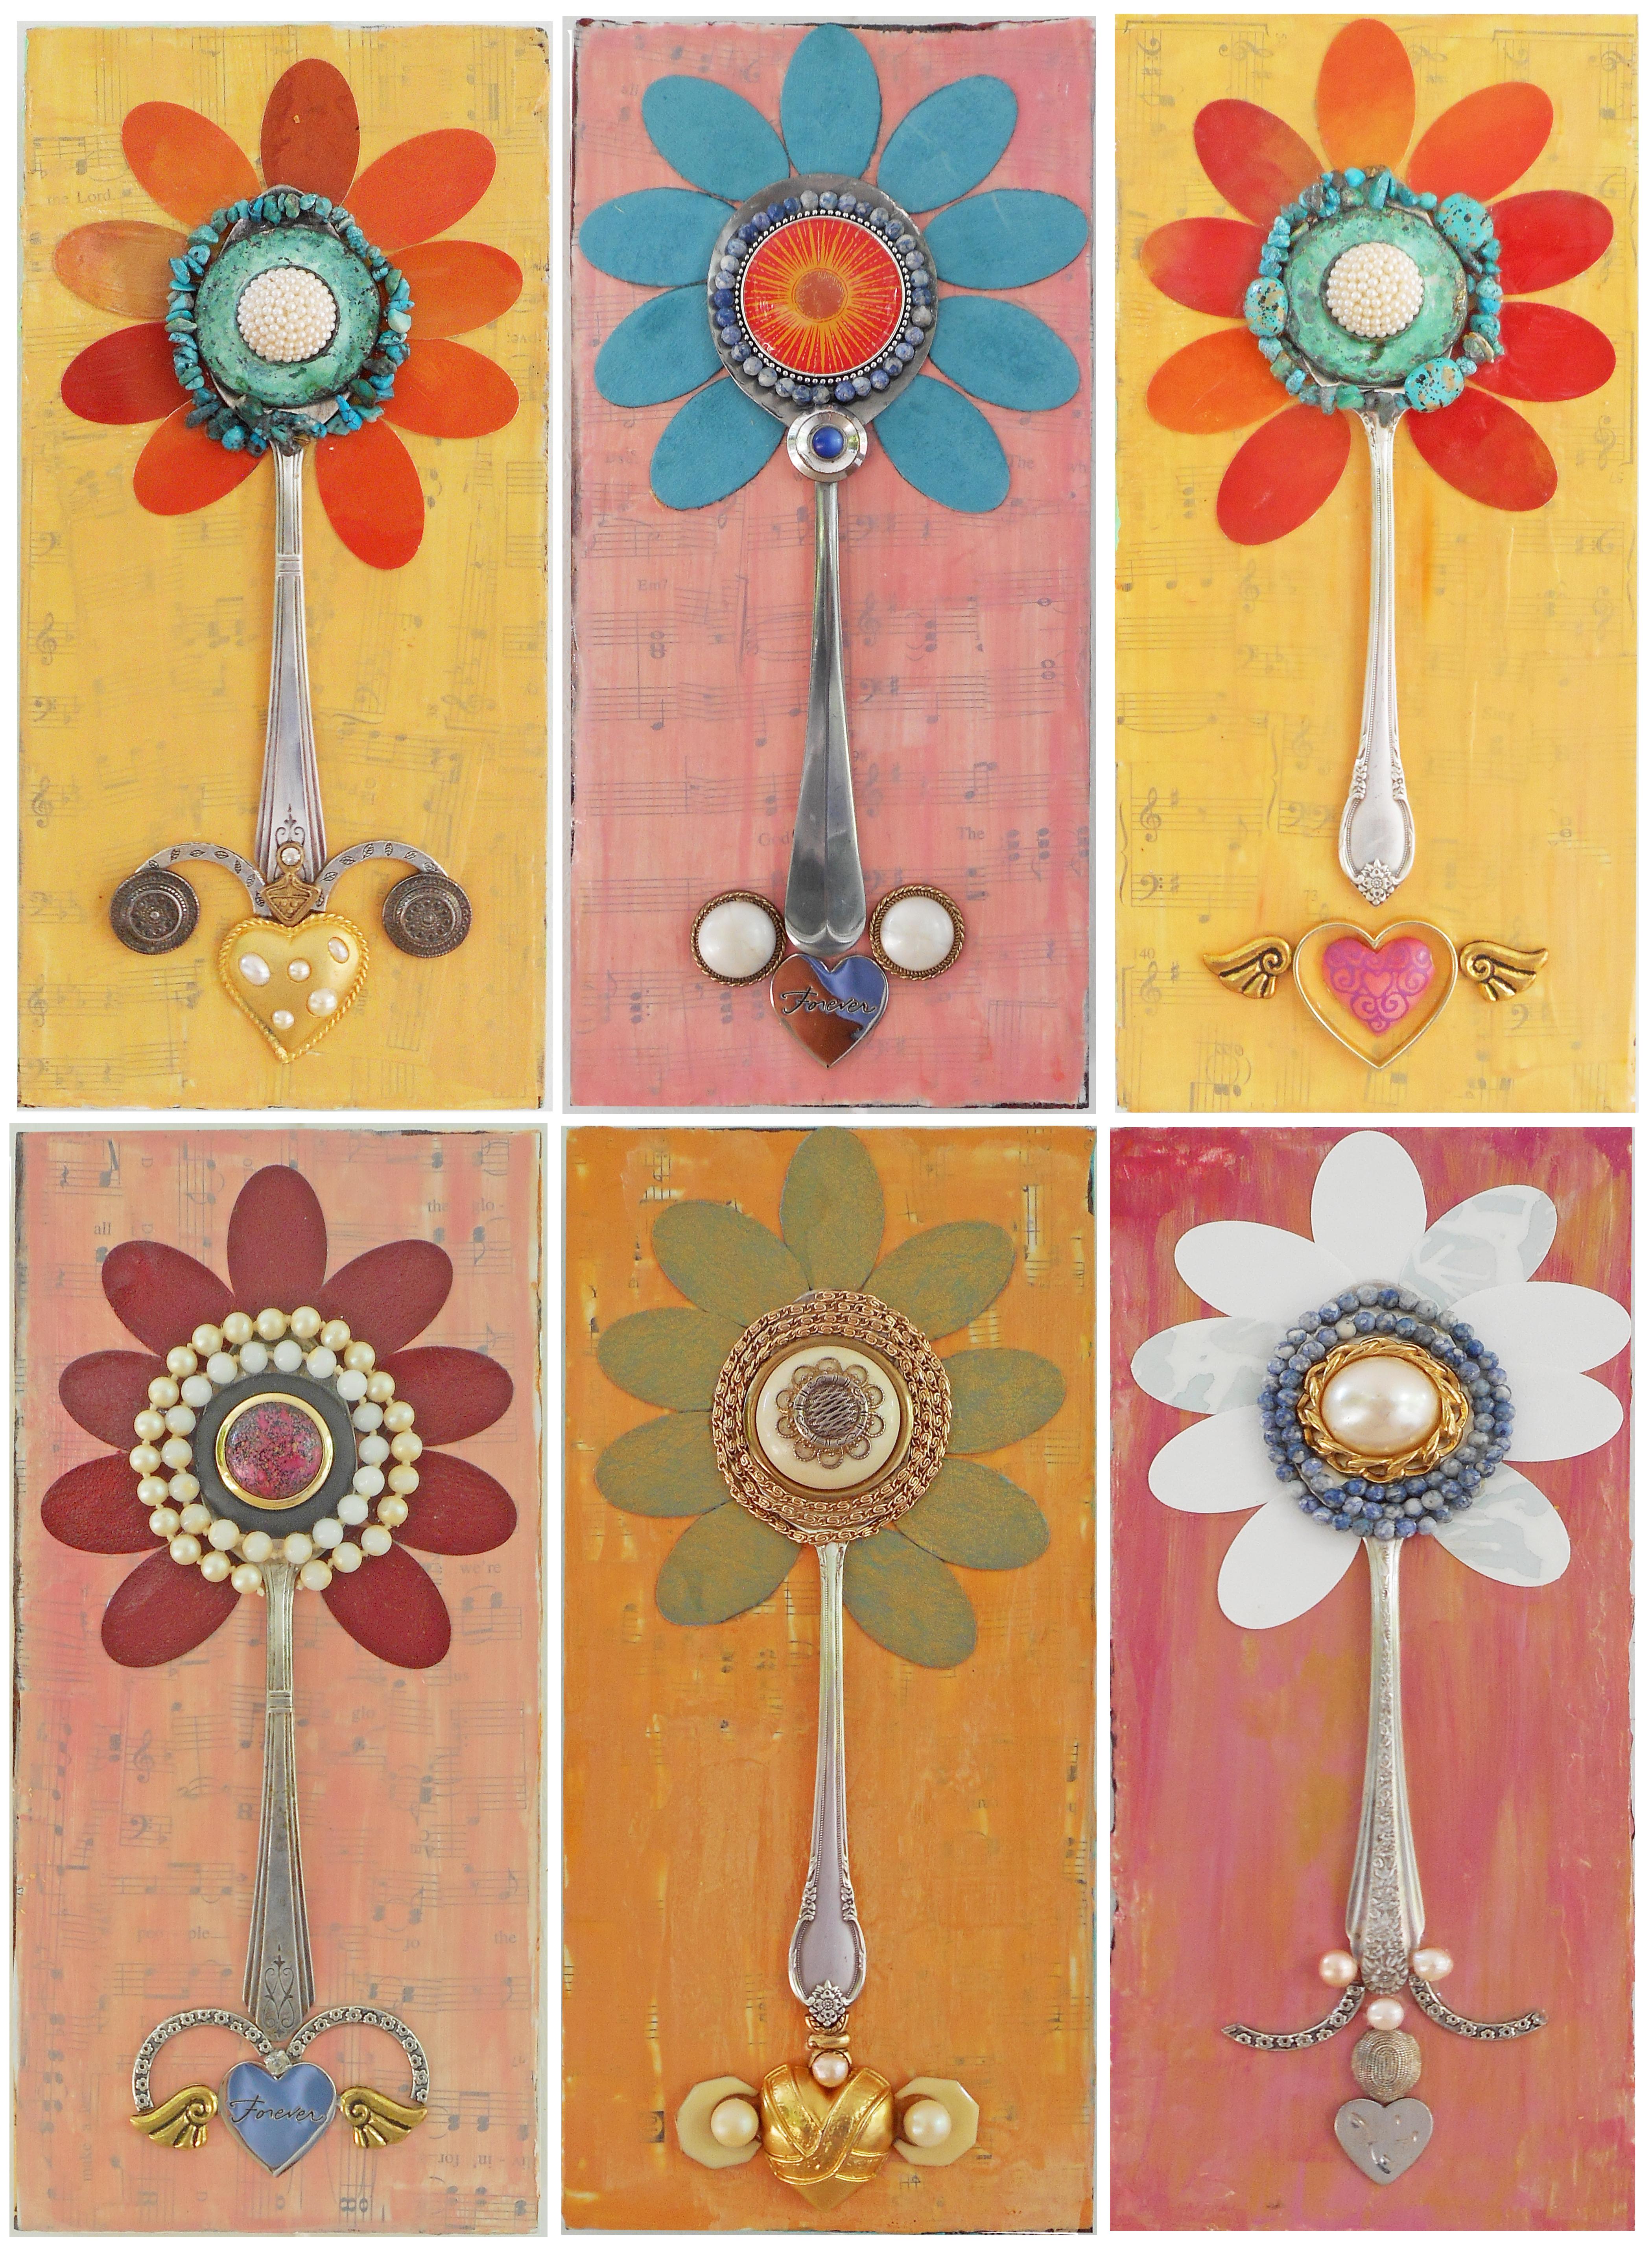 Colorful Spoons: Happy Colorful Designs « Fancy Flatware